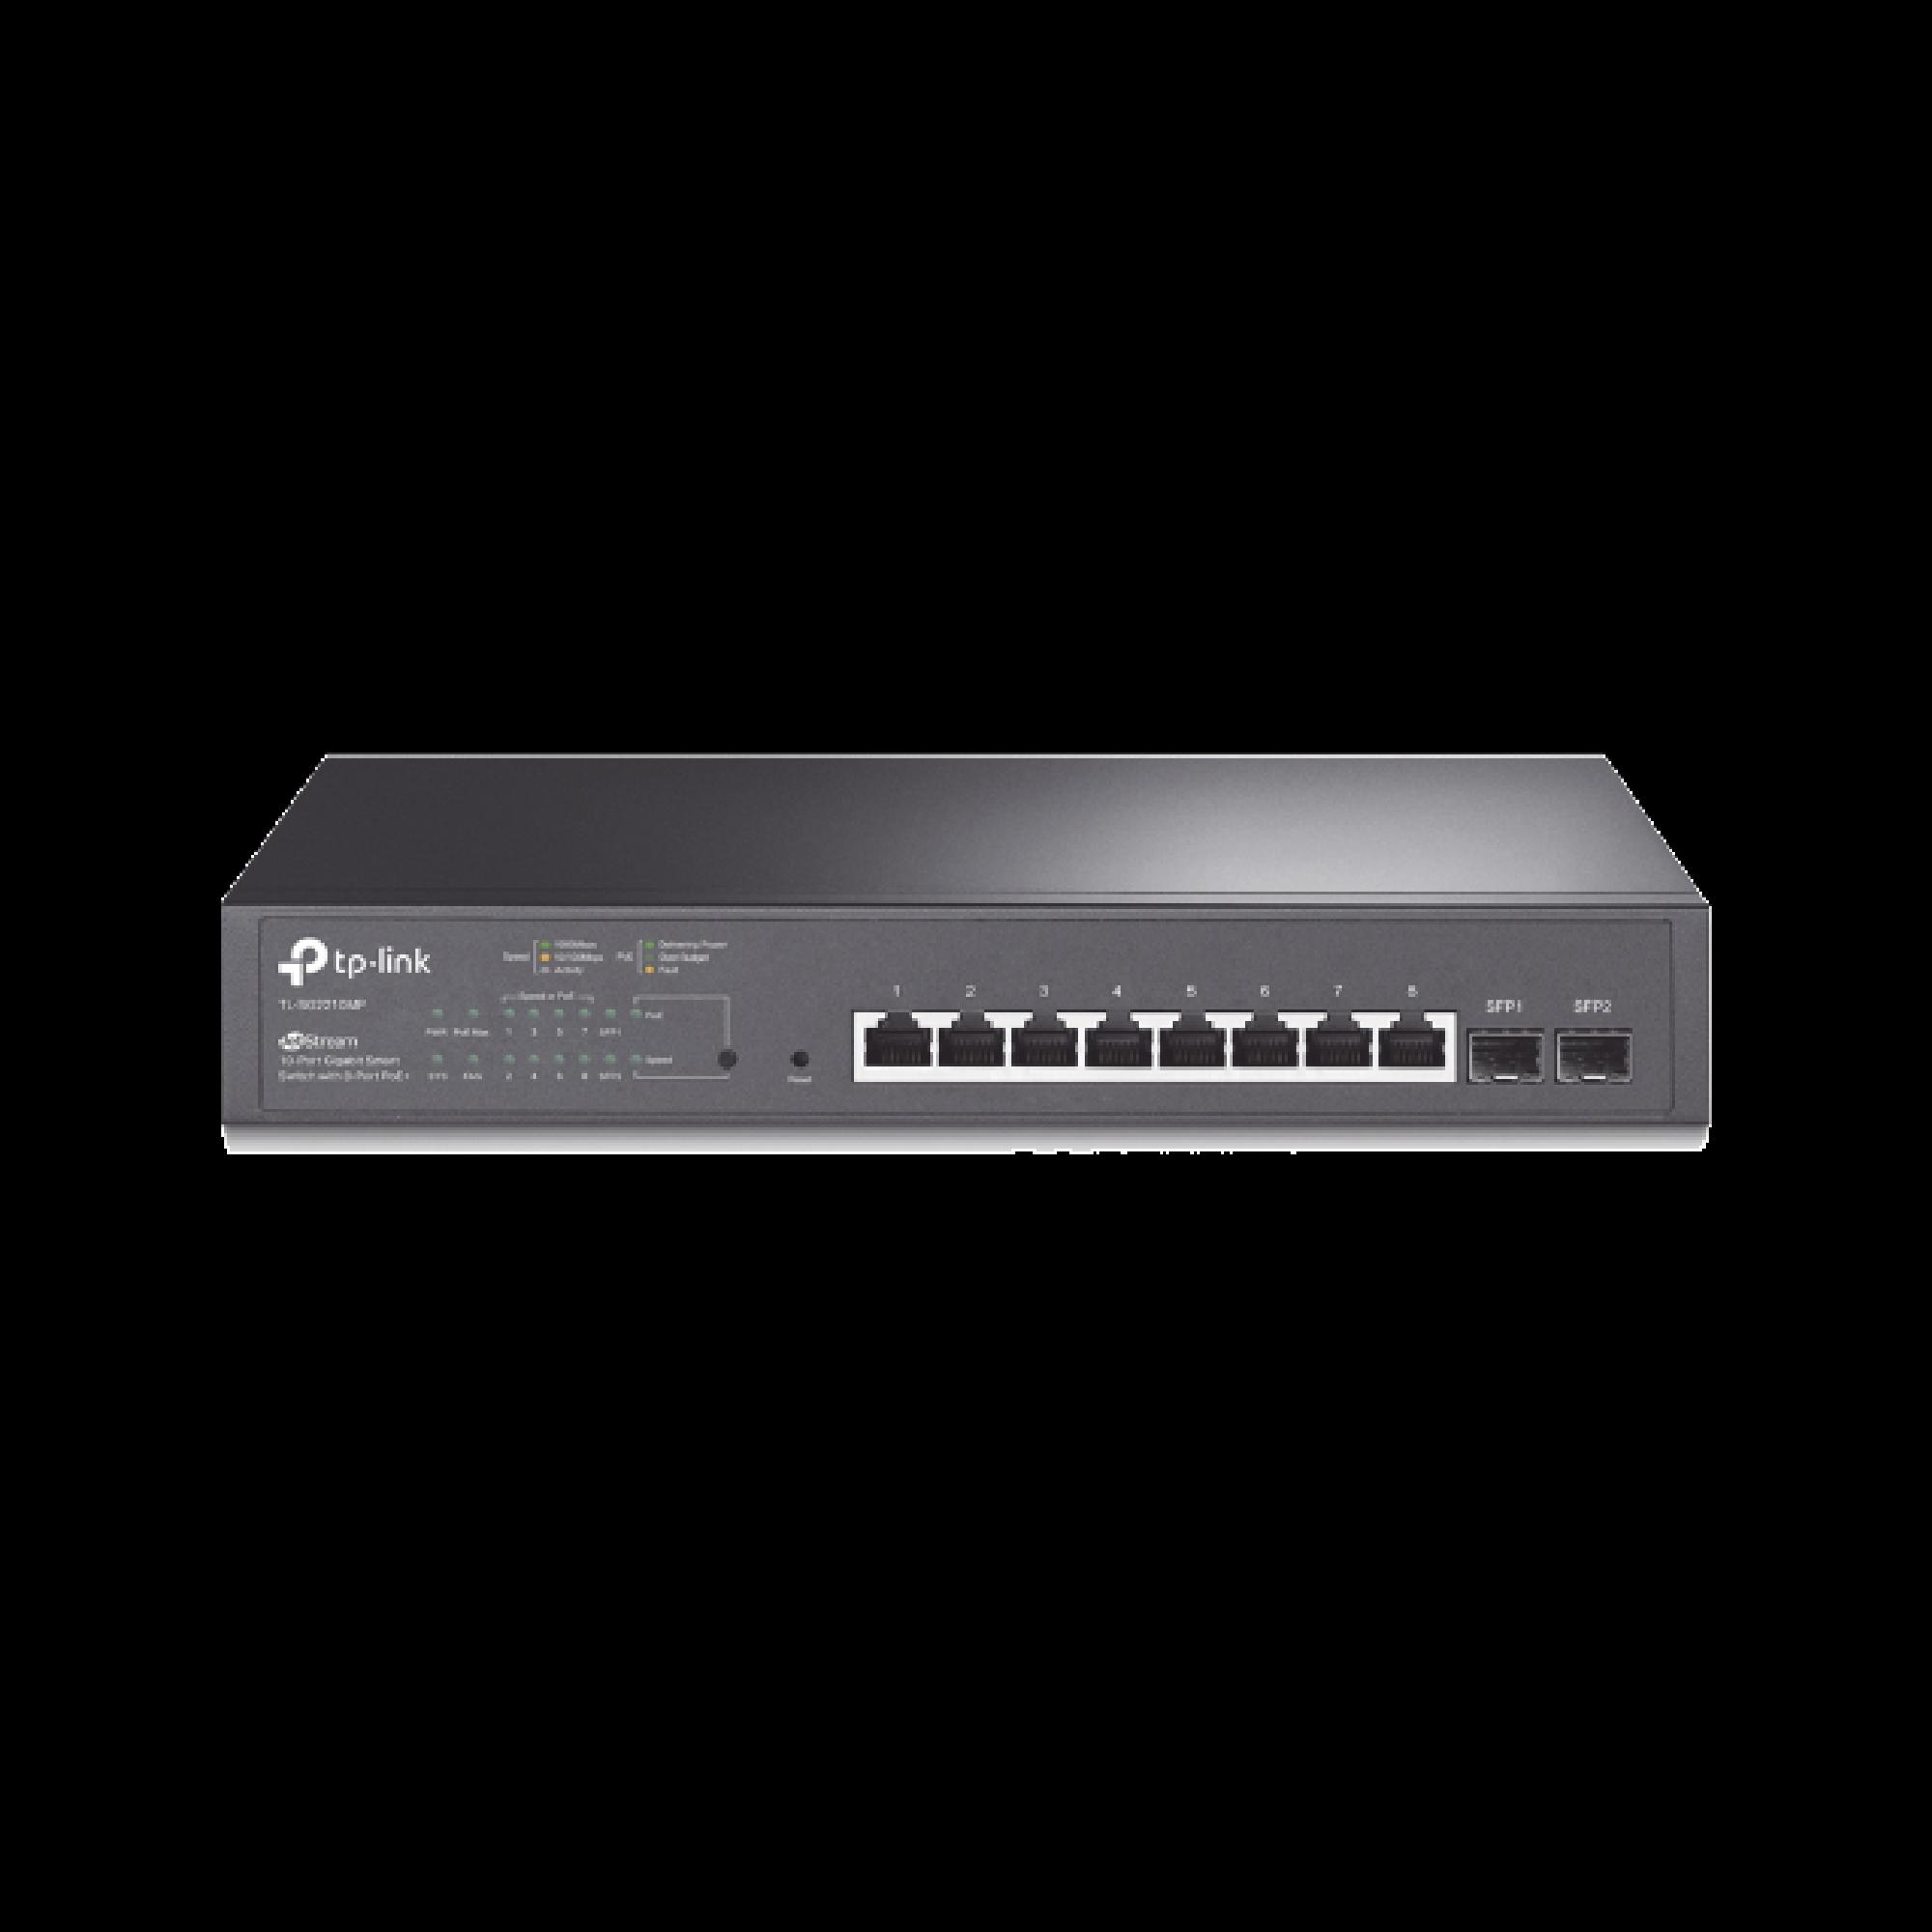 Switch PoE JetStream SDN Administrable 8 puertos 10/100/1000 Mbps + 2 puertos SFP, 8 puertos PoE, 150W, administracion centralizada OMADA SDN